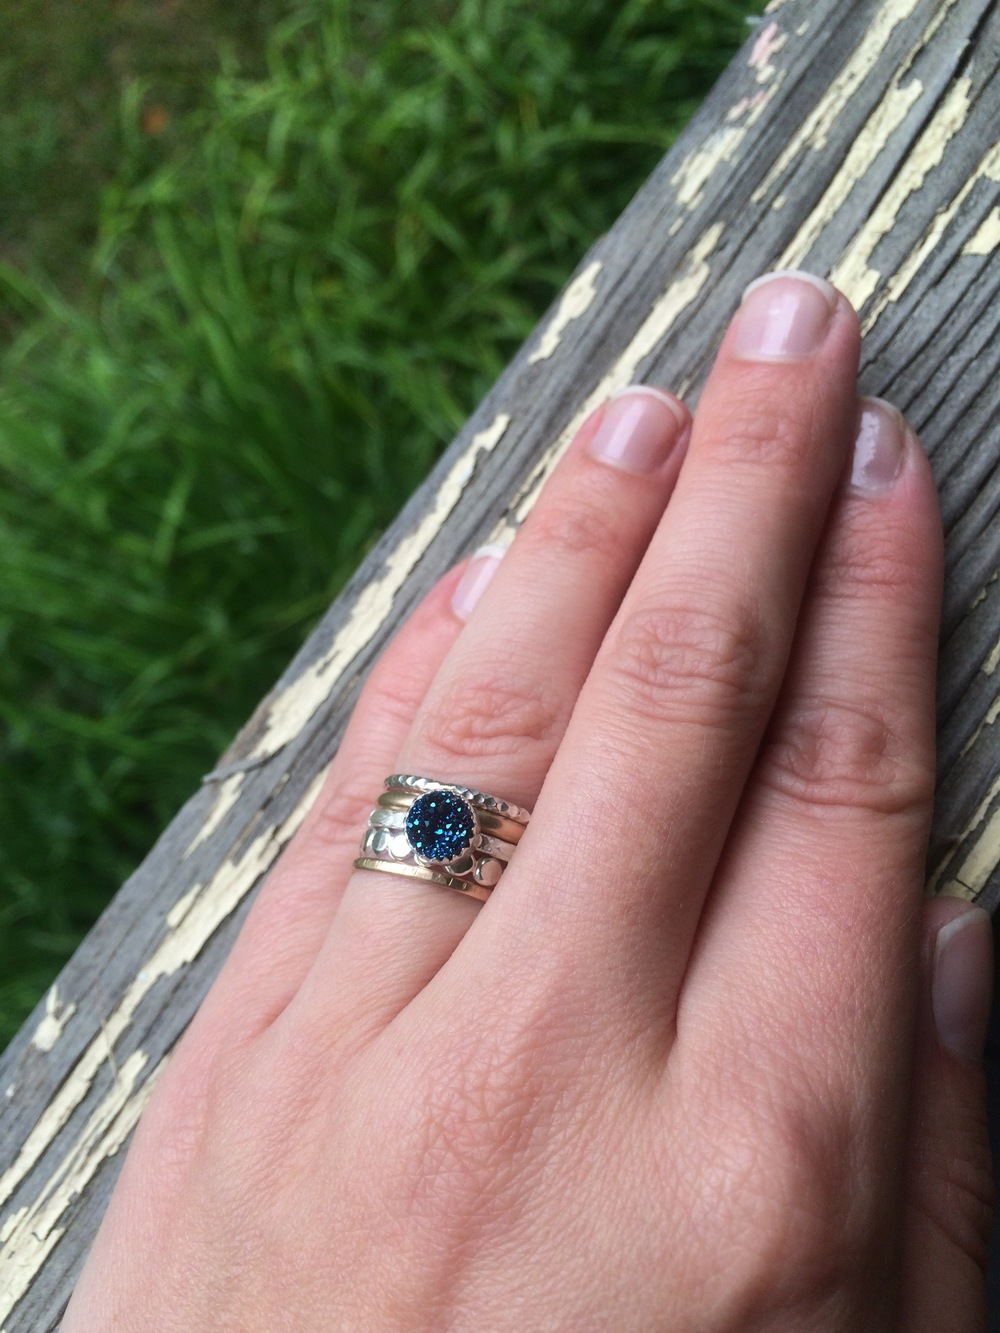 Rings — .: Parker Posie Jewelry Designs :.